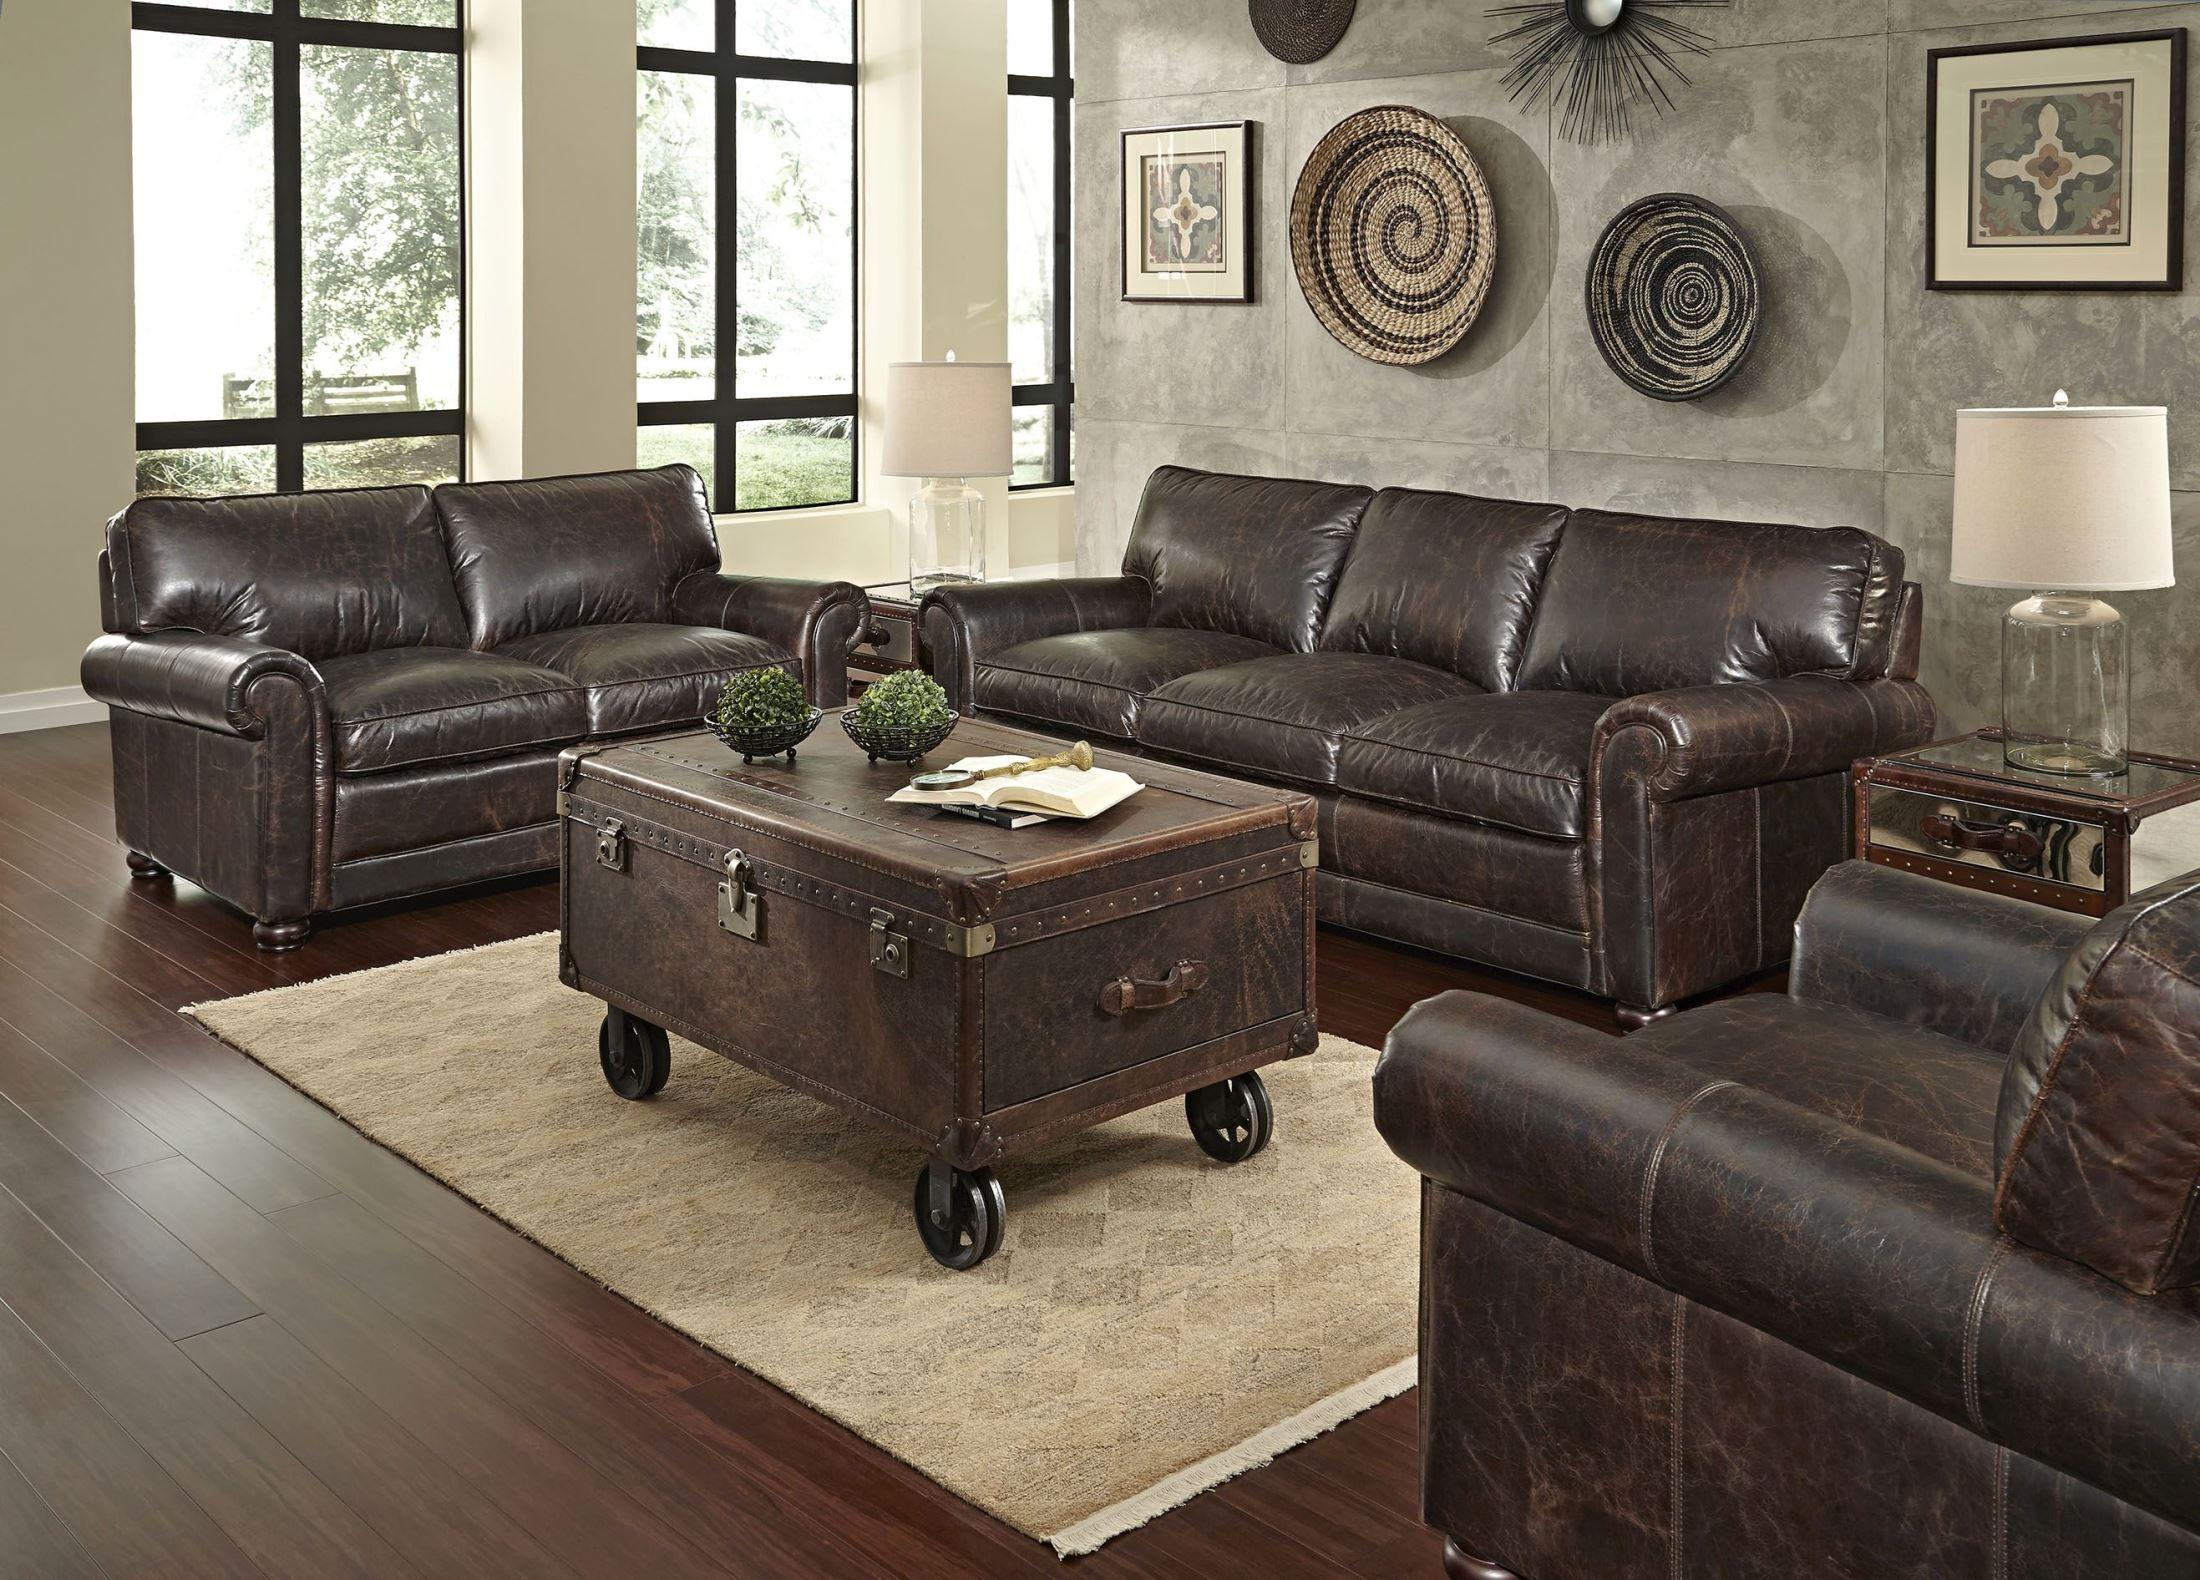 Genesis brompton chocolate leather living room set from - Chocolate leather living room furniture ...